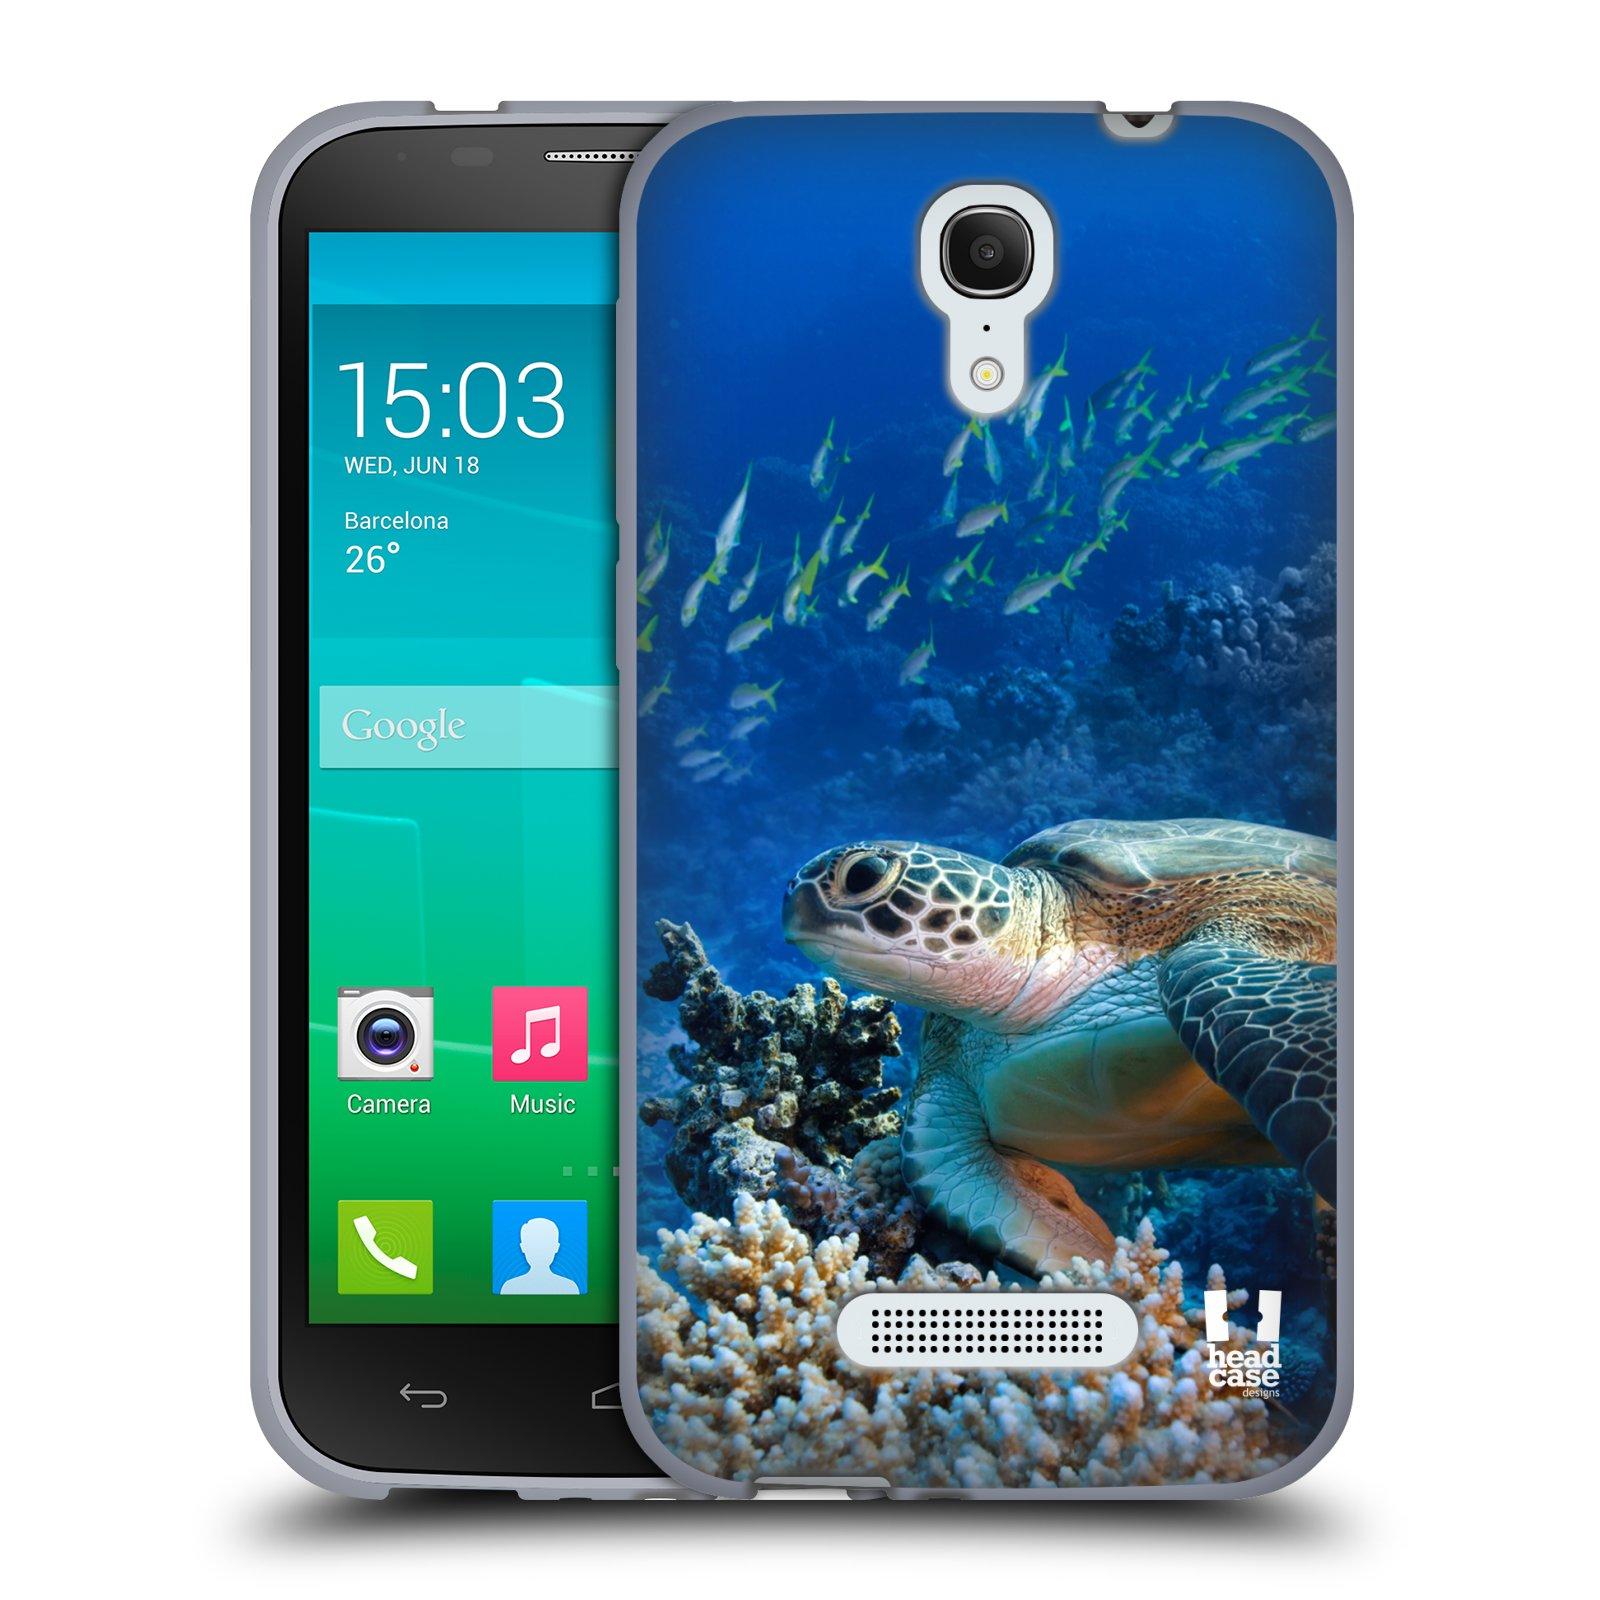 HEAD CASE silikonový obal na mobil Alcatel POP S7 vzor Divočina, Divoký život a zvířata foto MOŘSKÁ ŽELVA MODRÁ PODMOŘSKÁ HLADINA